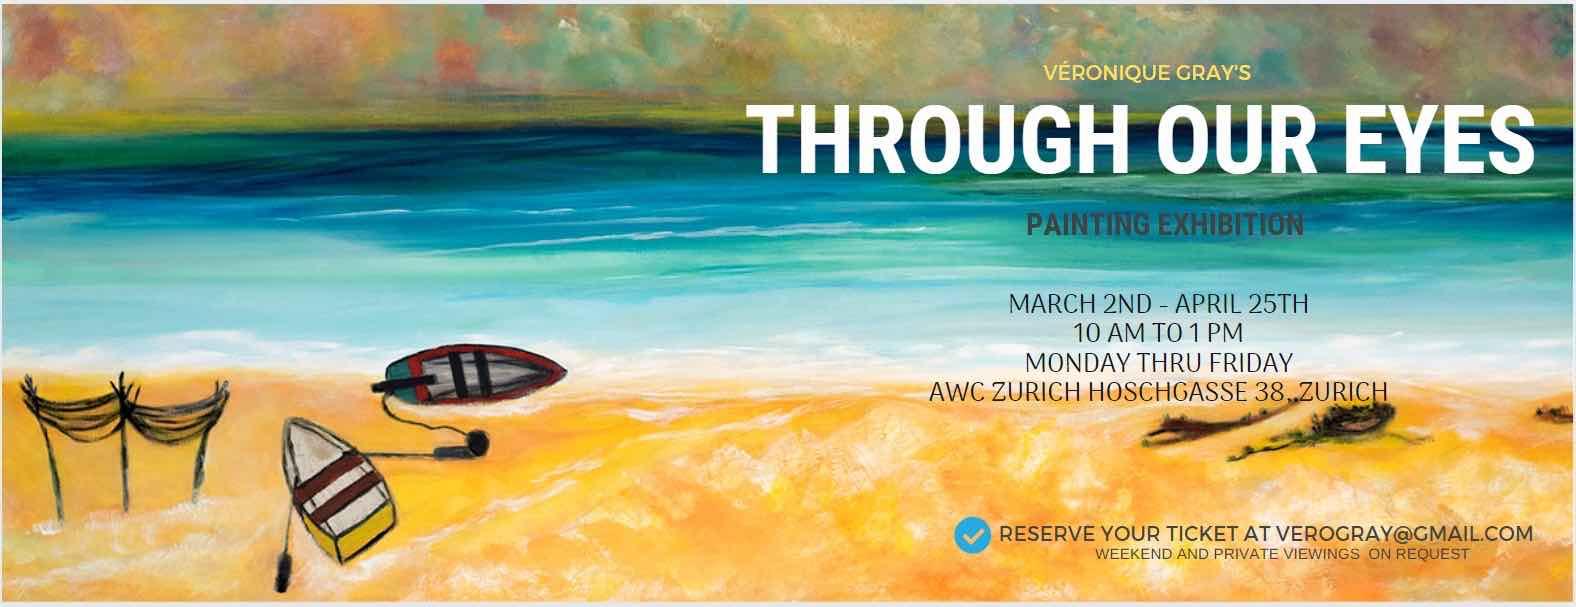 VERONIQUE GRAY'S ART EXHIBITION